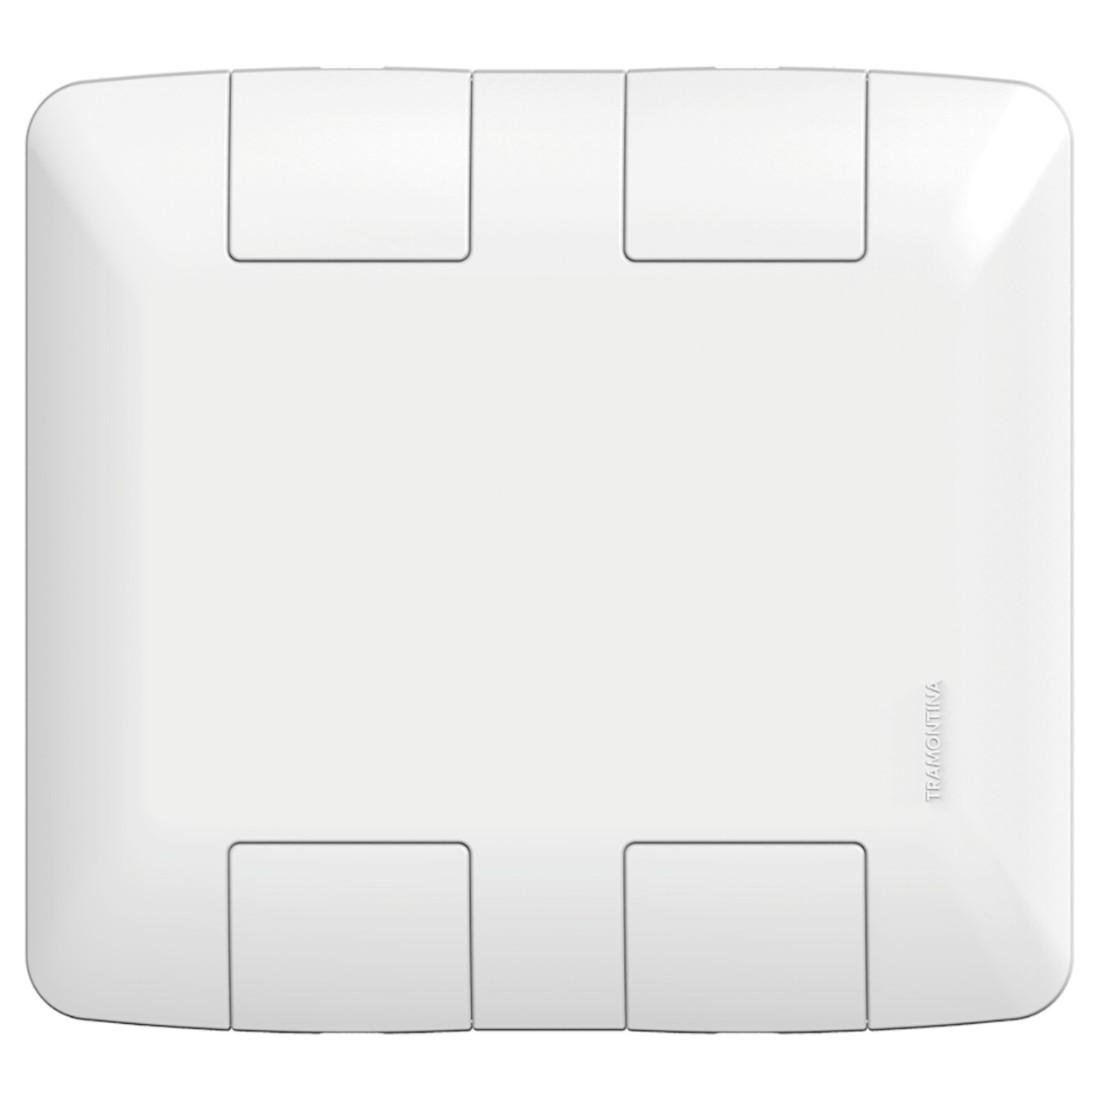 Placa 4x4 Cega Branco 57203021 Aria - Tramontina